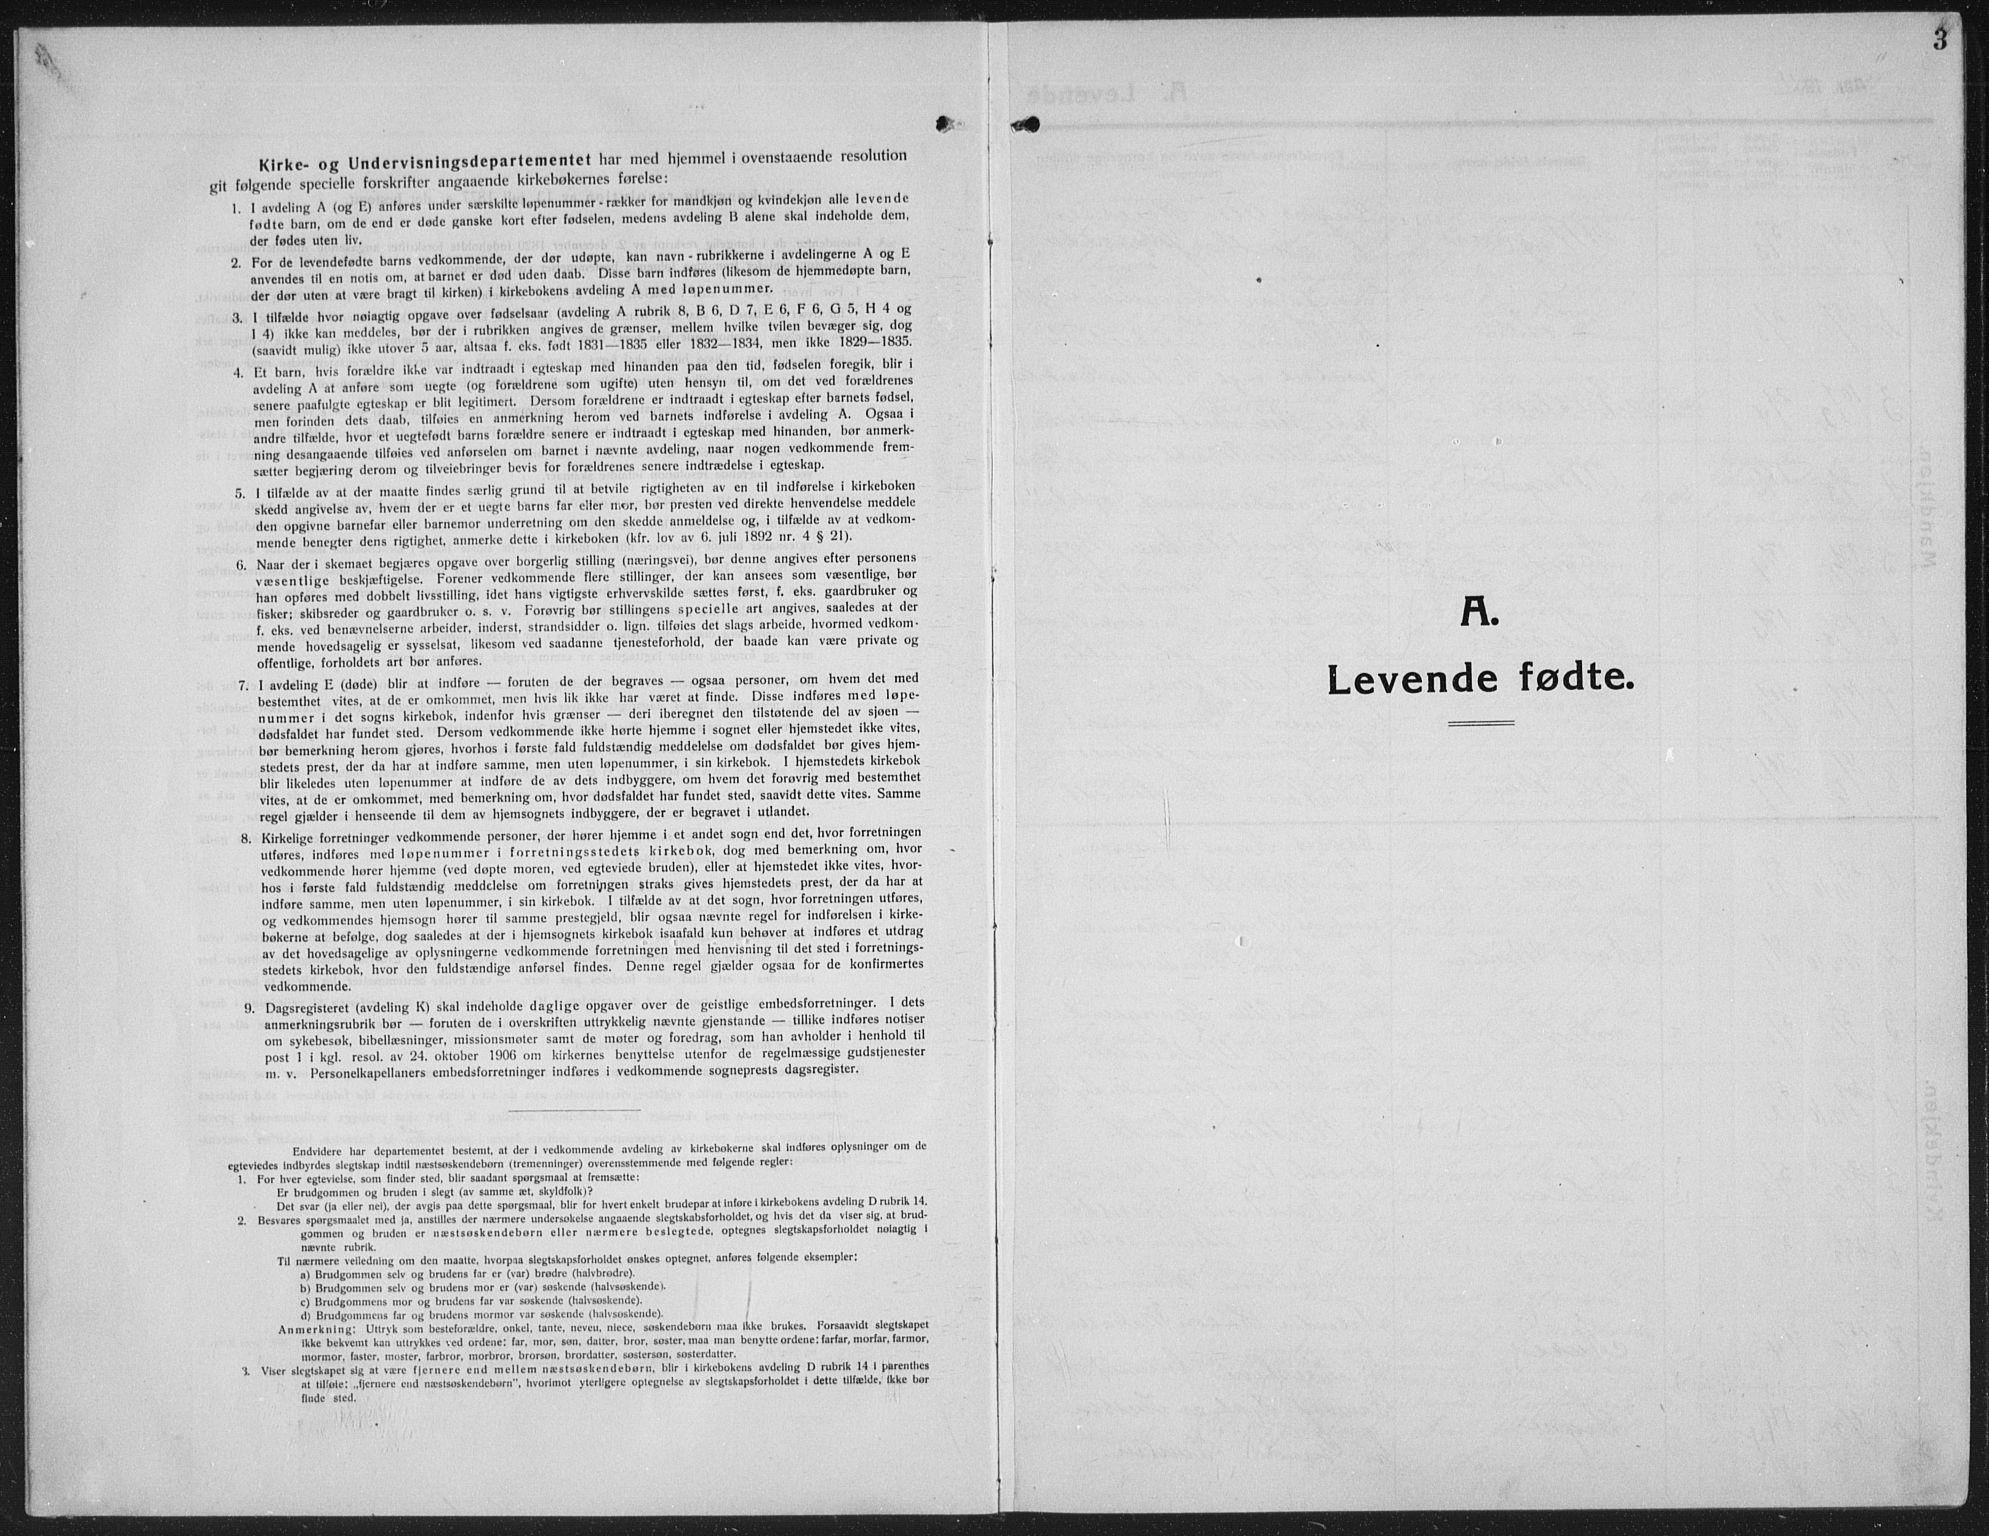 SAH, Ringebu prestekontor, Klokkerbok nr. 10, 1911-1934, s. 3